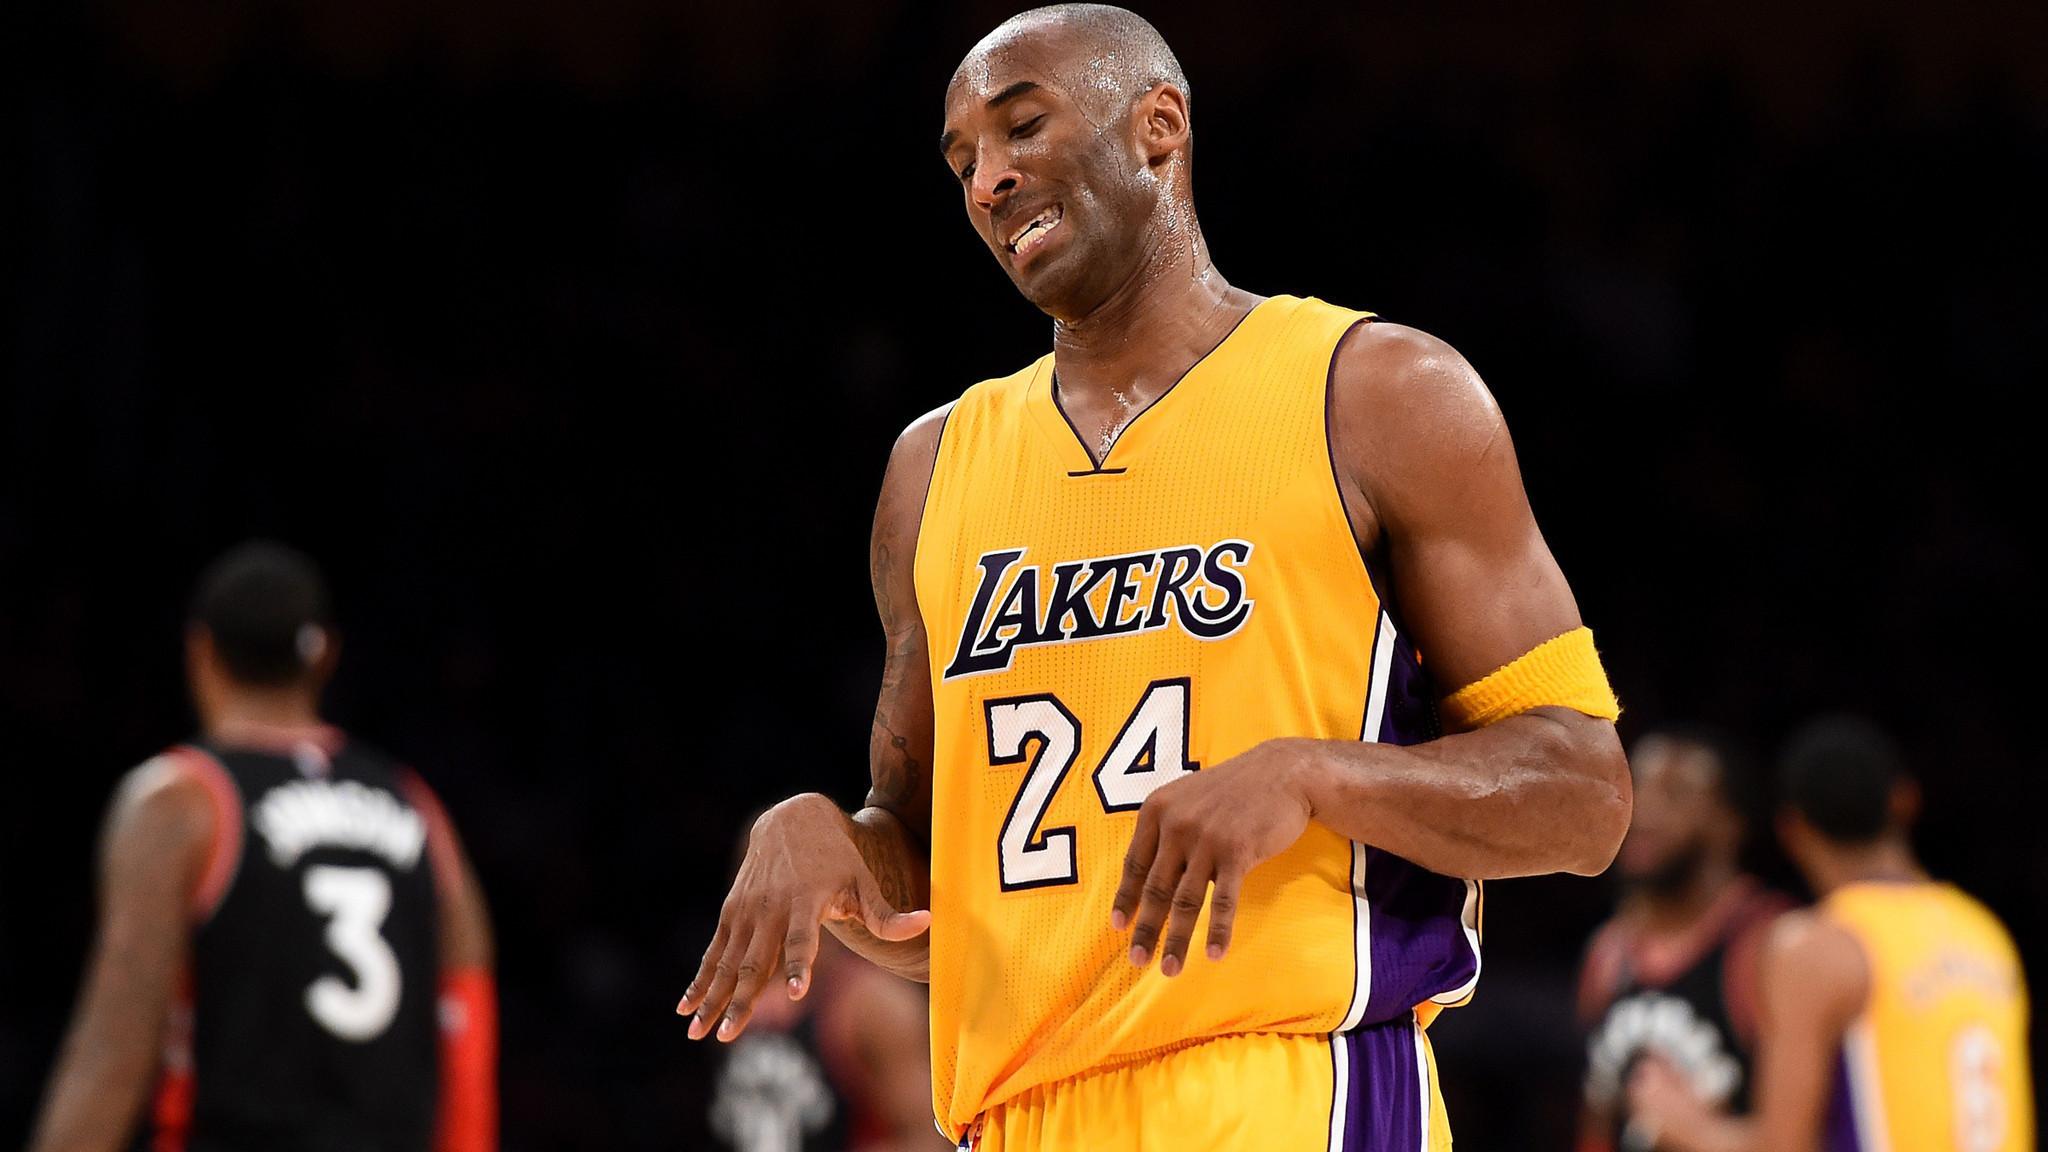 Kobe Bryant Free Download